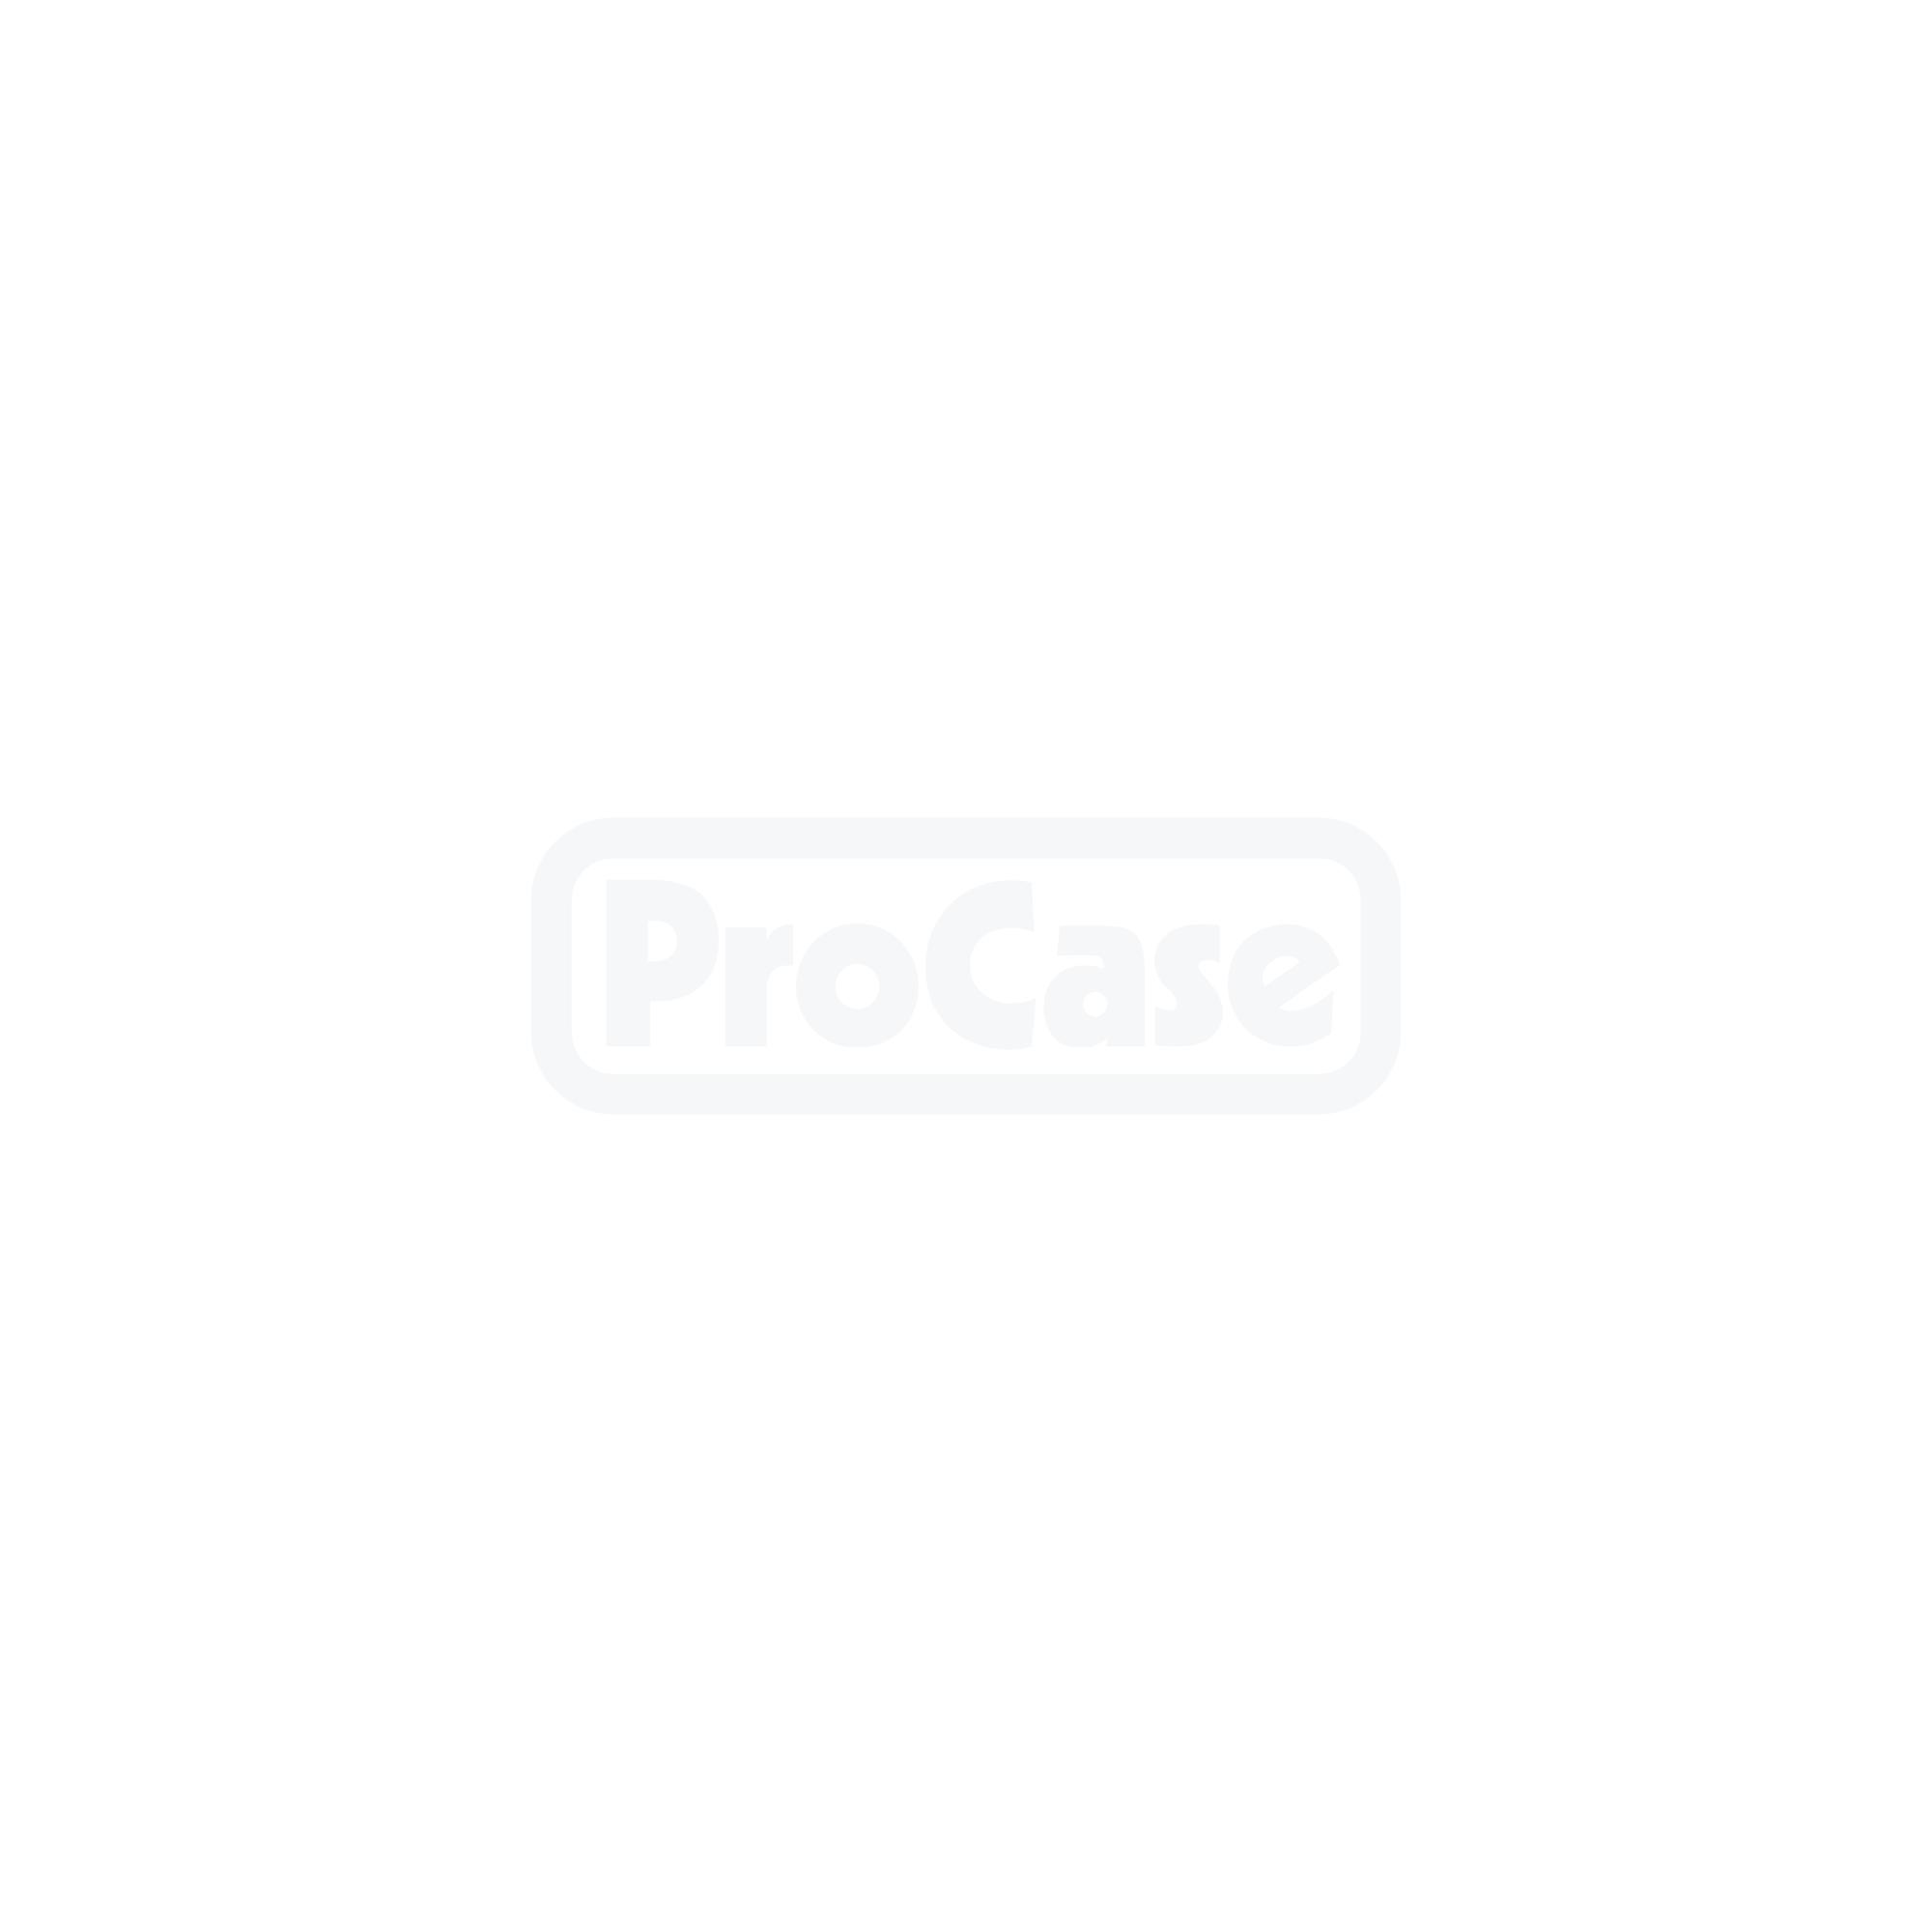 SKB 3i Koffer 2011-8B mit Rasterschaumstoff